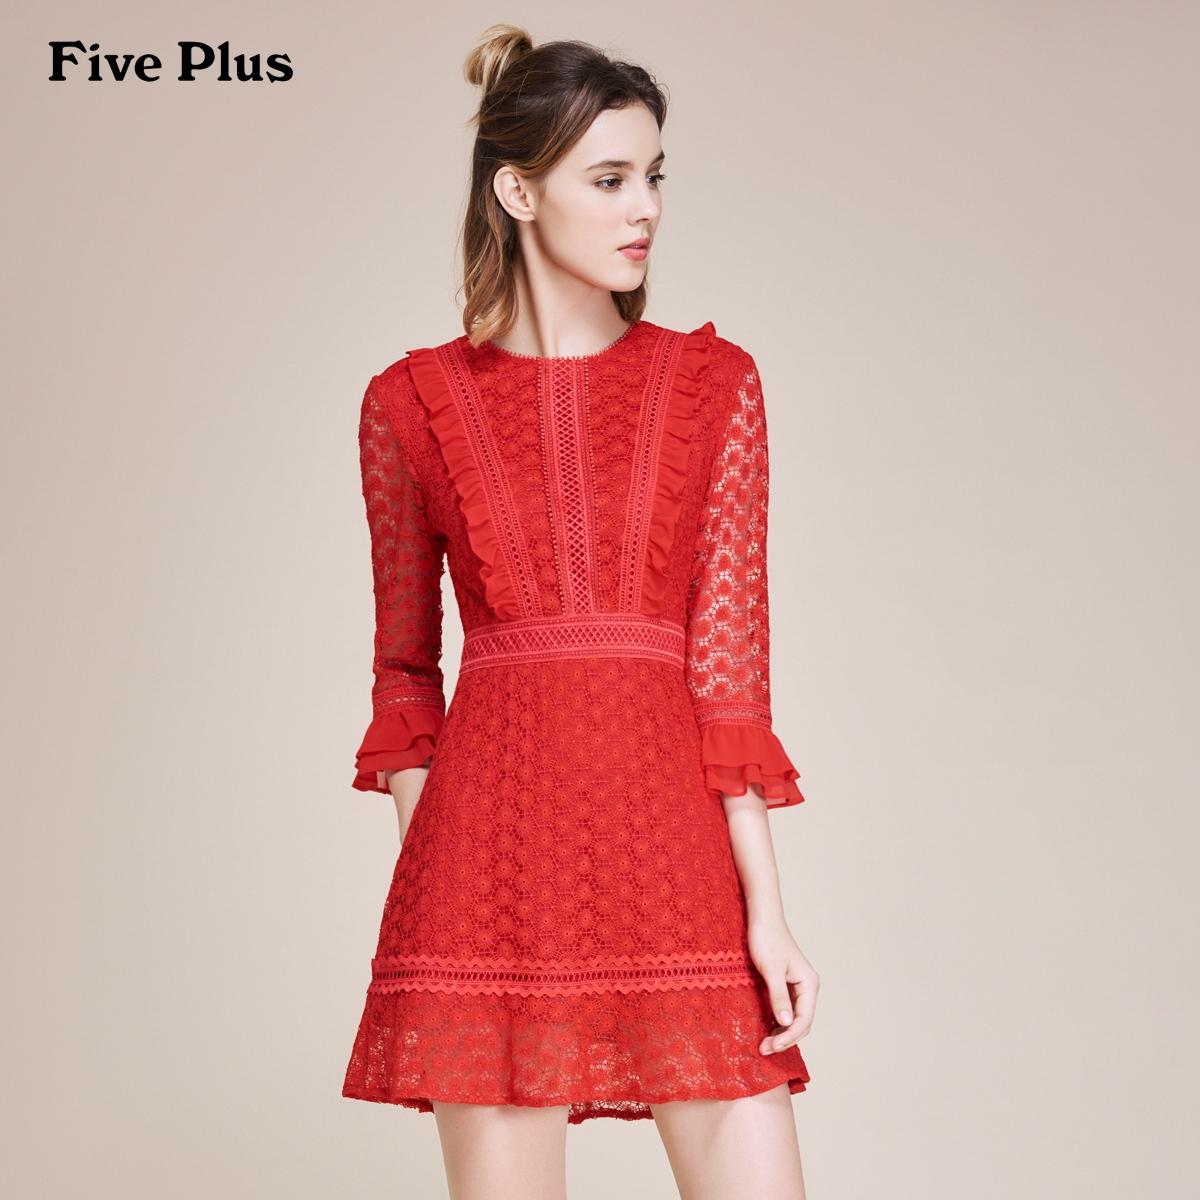 Five Plus新女装纯色刺绣拼荷叶边高腰连衣裙2JF3087870